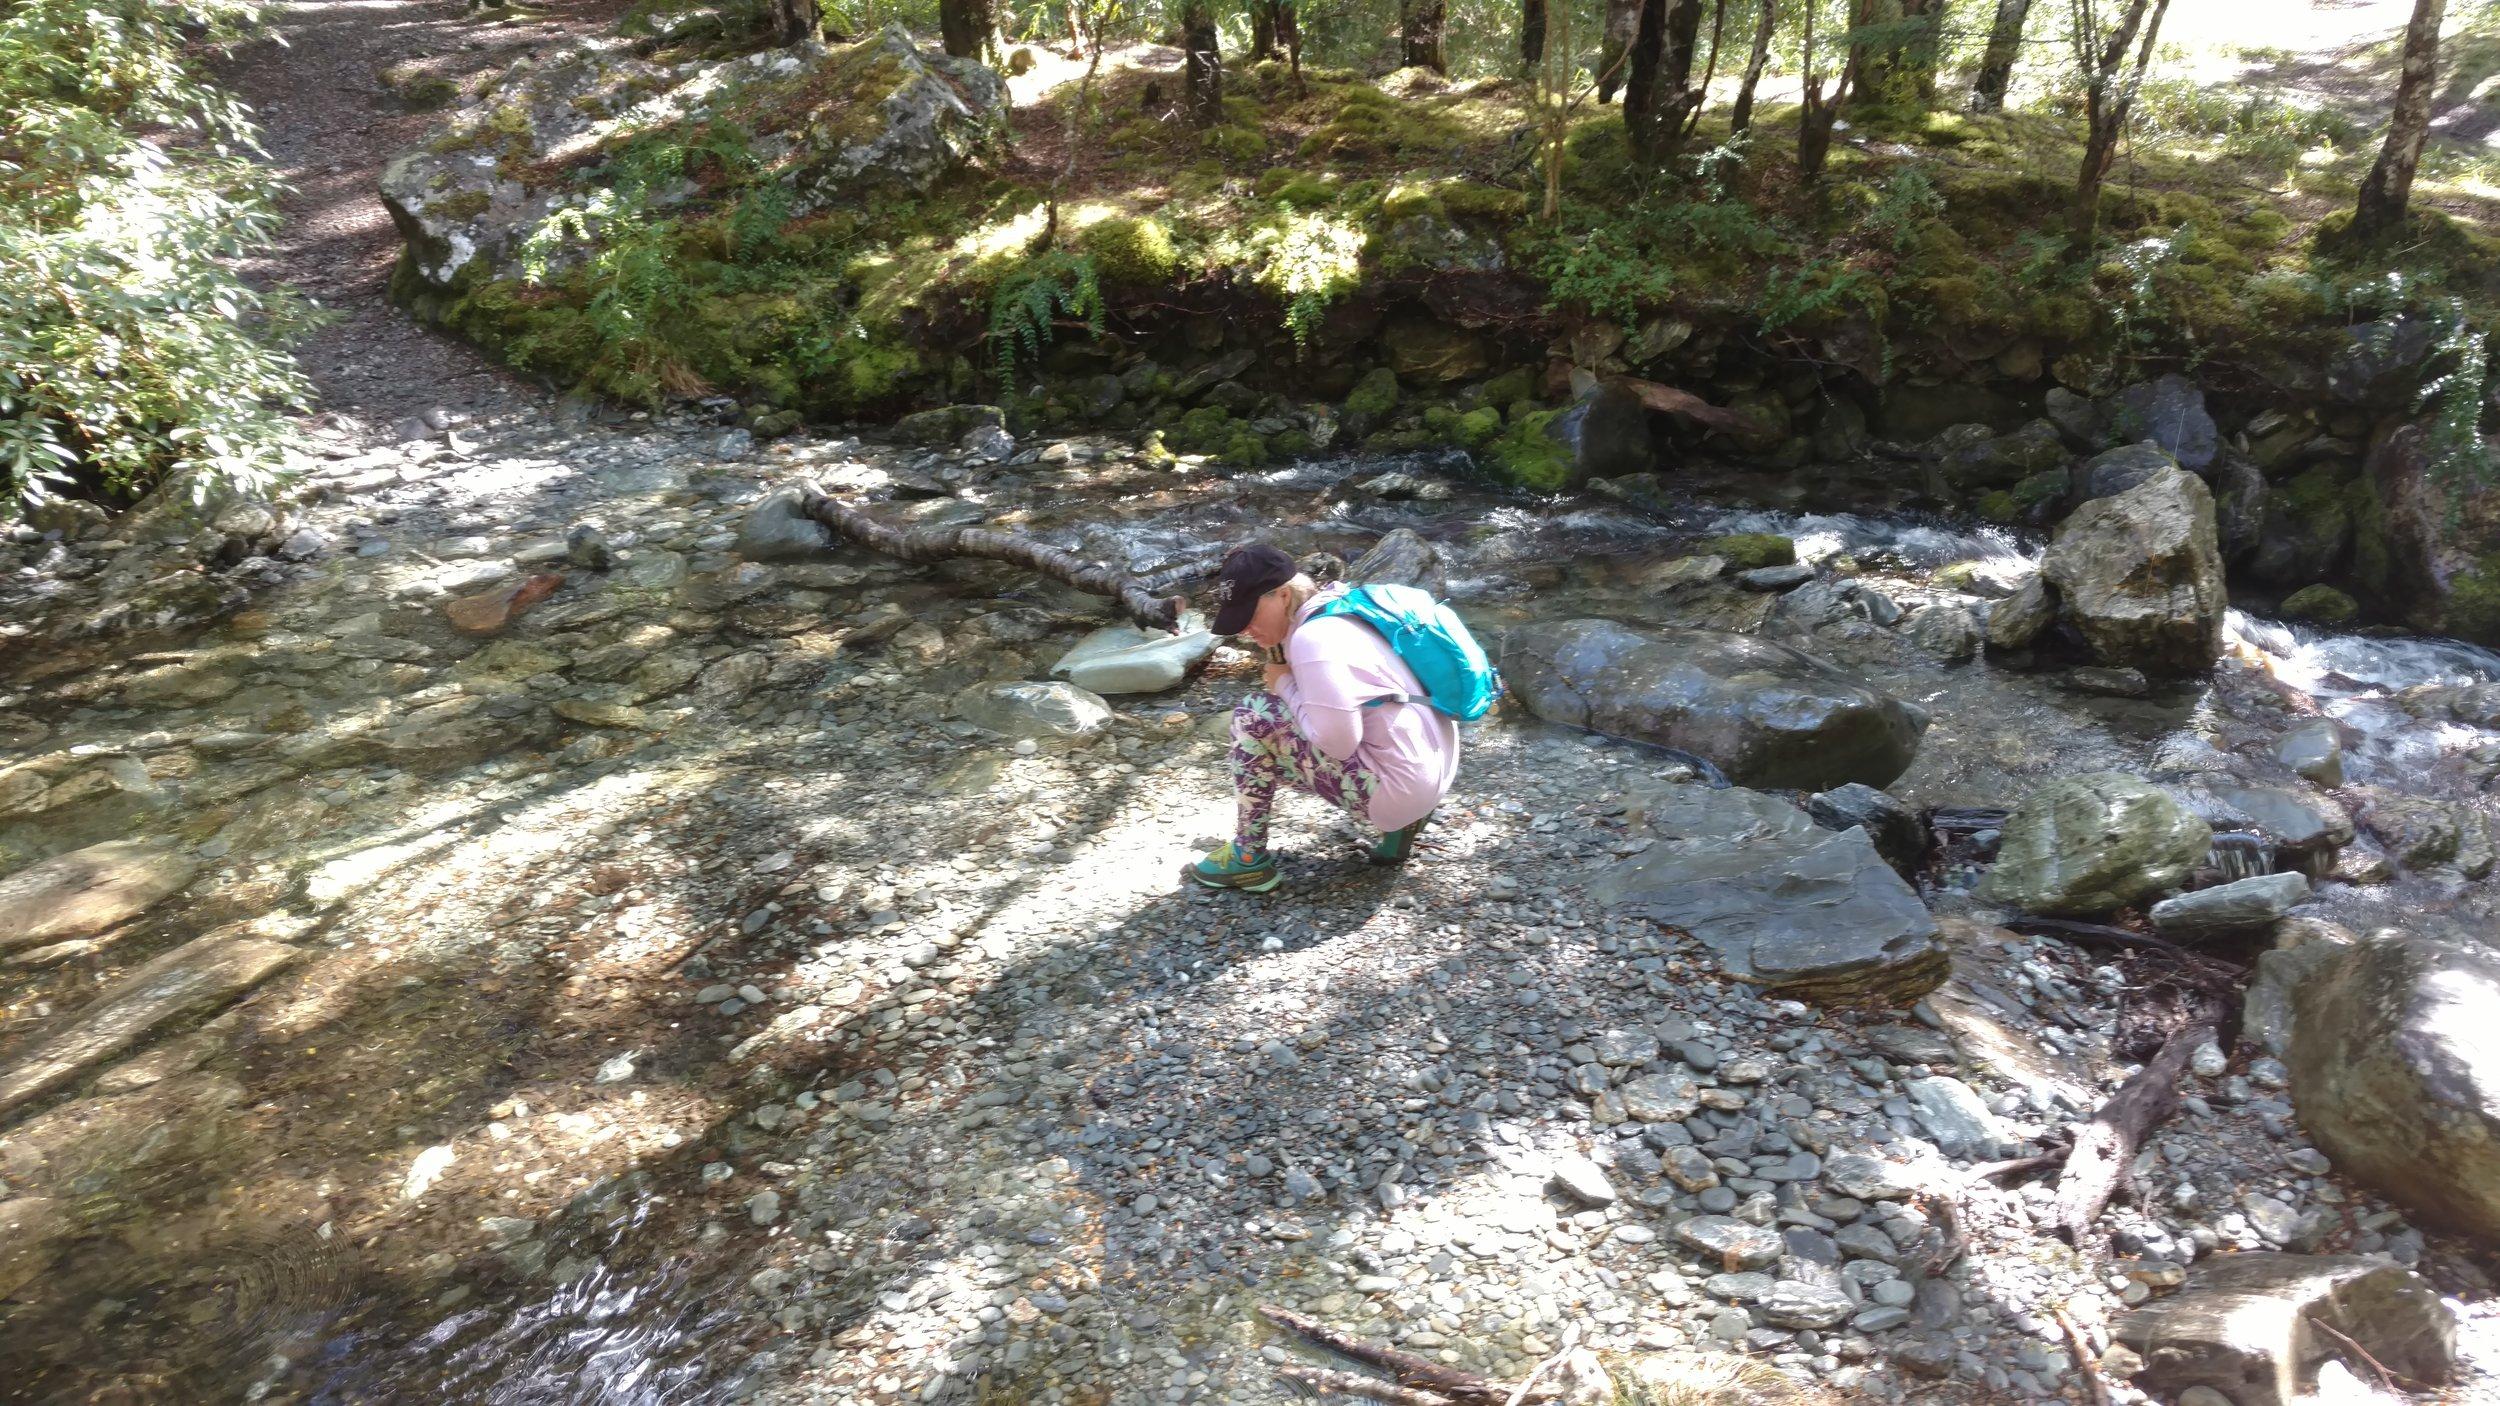 Below the bridge, Linda looking for potential stones